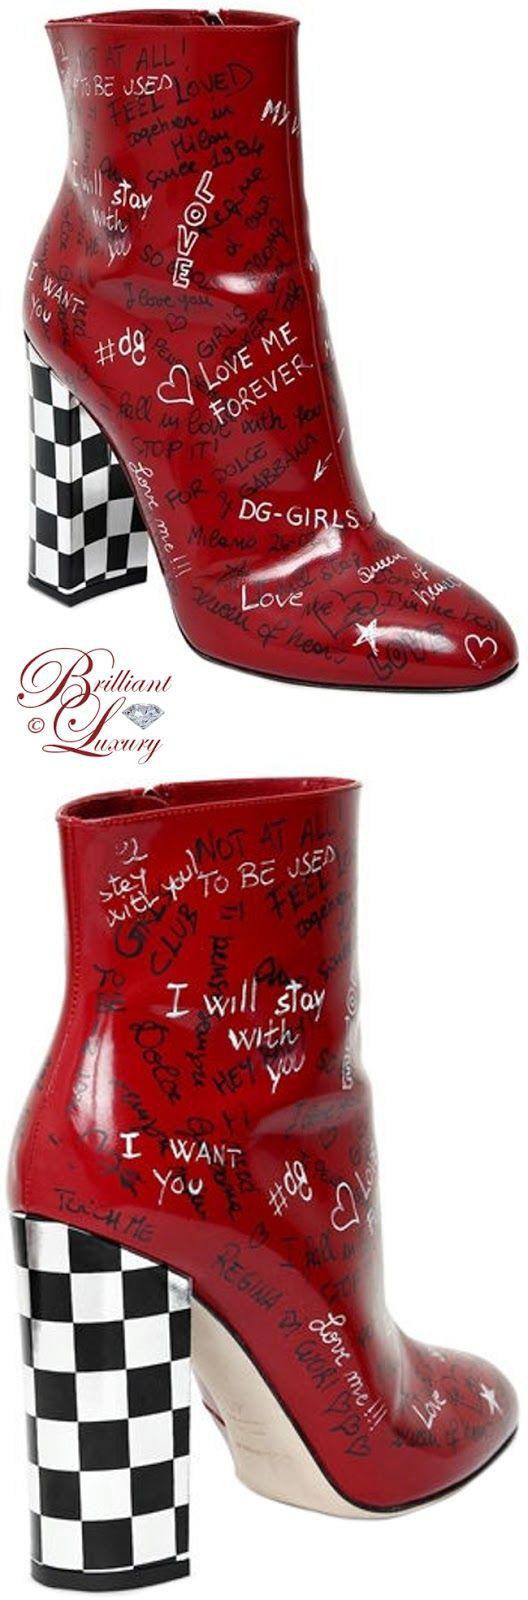 Brilliant Luxury ♦ Dolce & Gabbana Graffiti Leather Ankle Boots